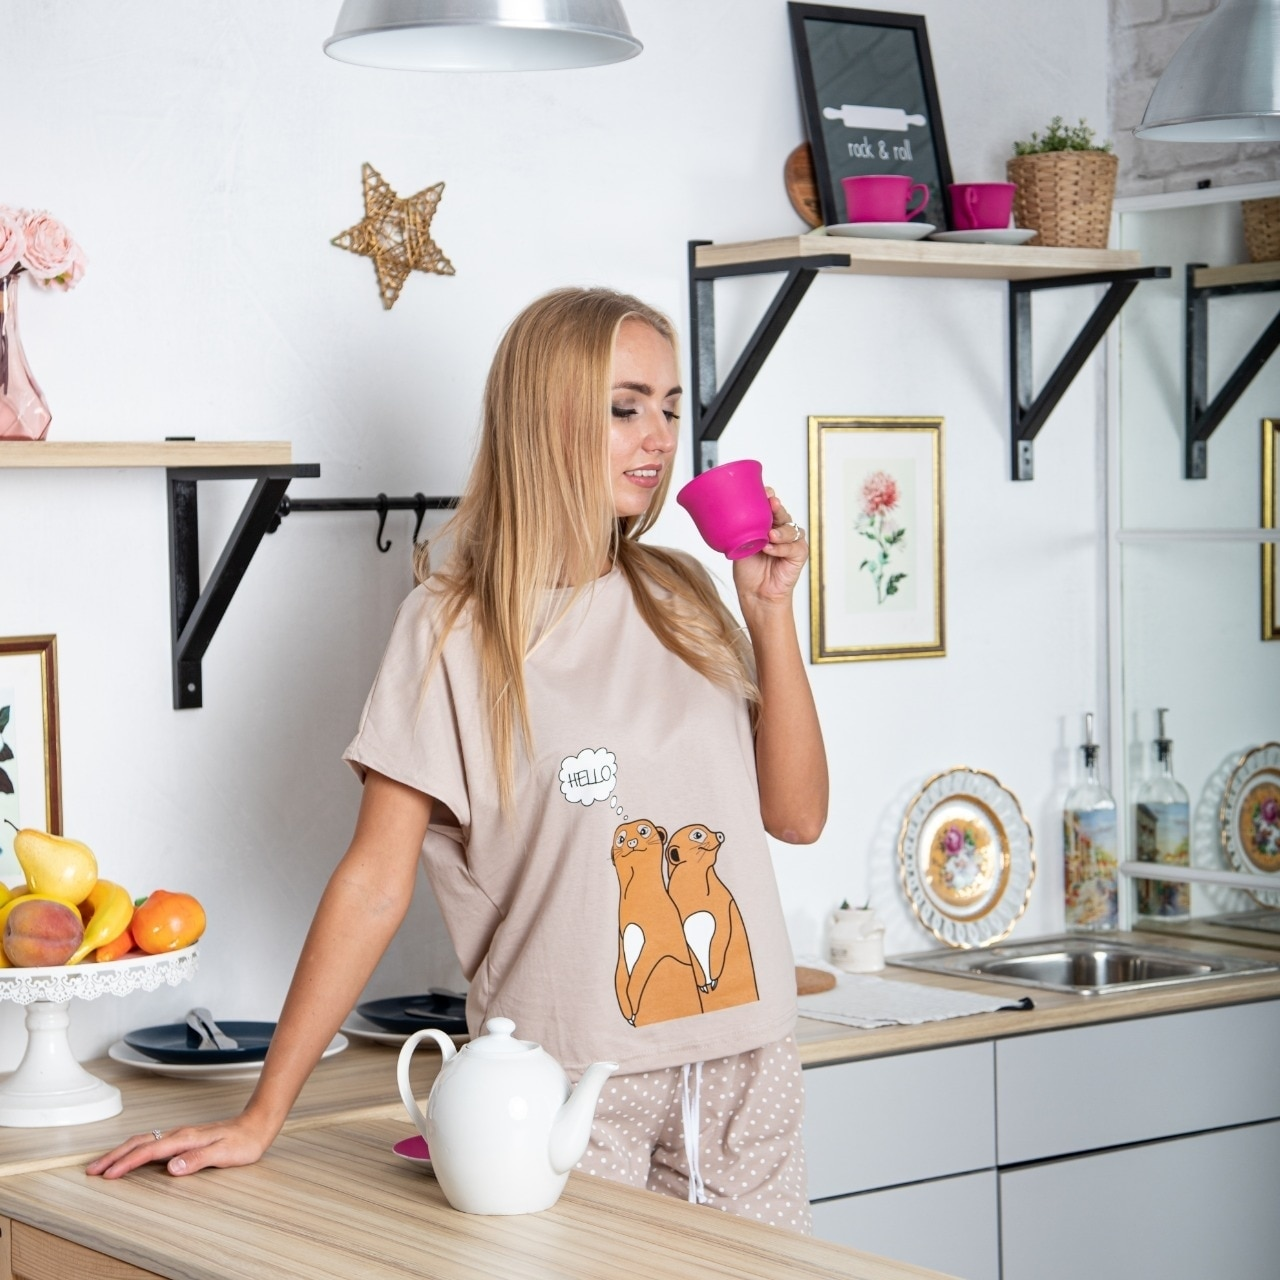 Atoff home pajamas female ZHP 010/1 (beige/Gray)|Pajama Sets| - AliExpress